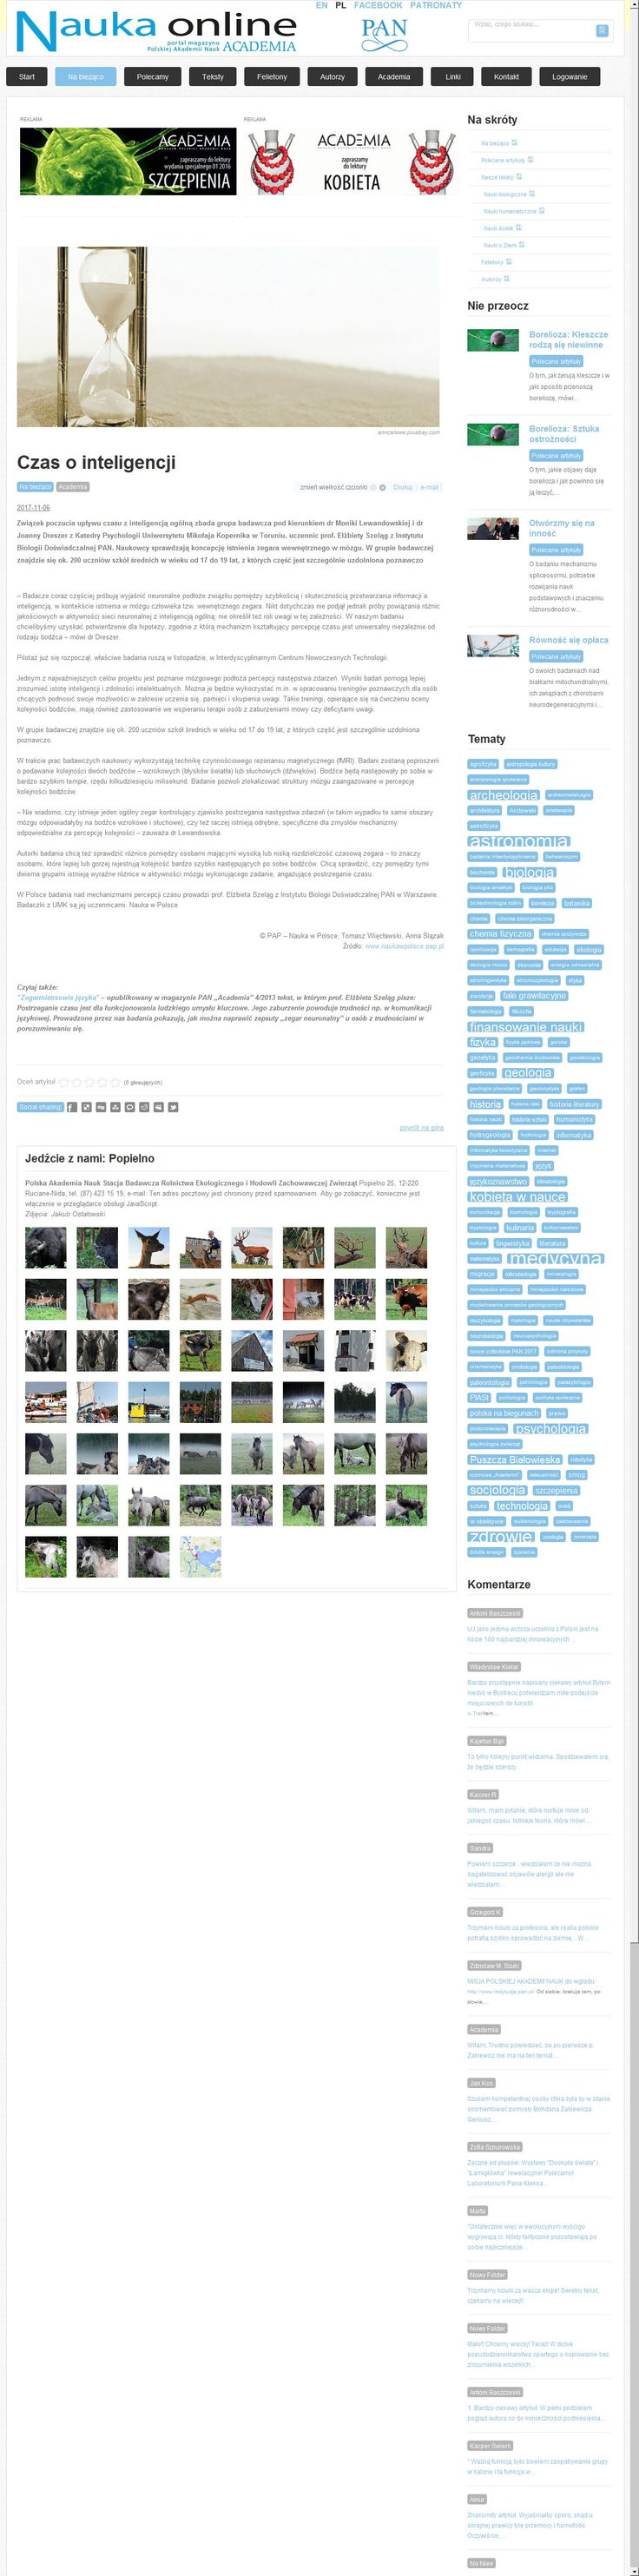 http://nencki.inforia.net/przeglad.php?mode=podglad&id2=185849522